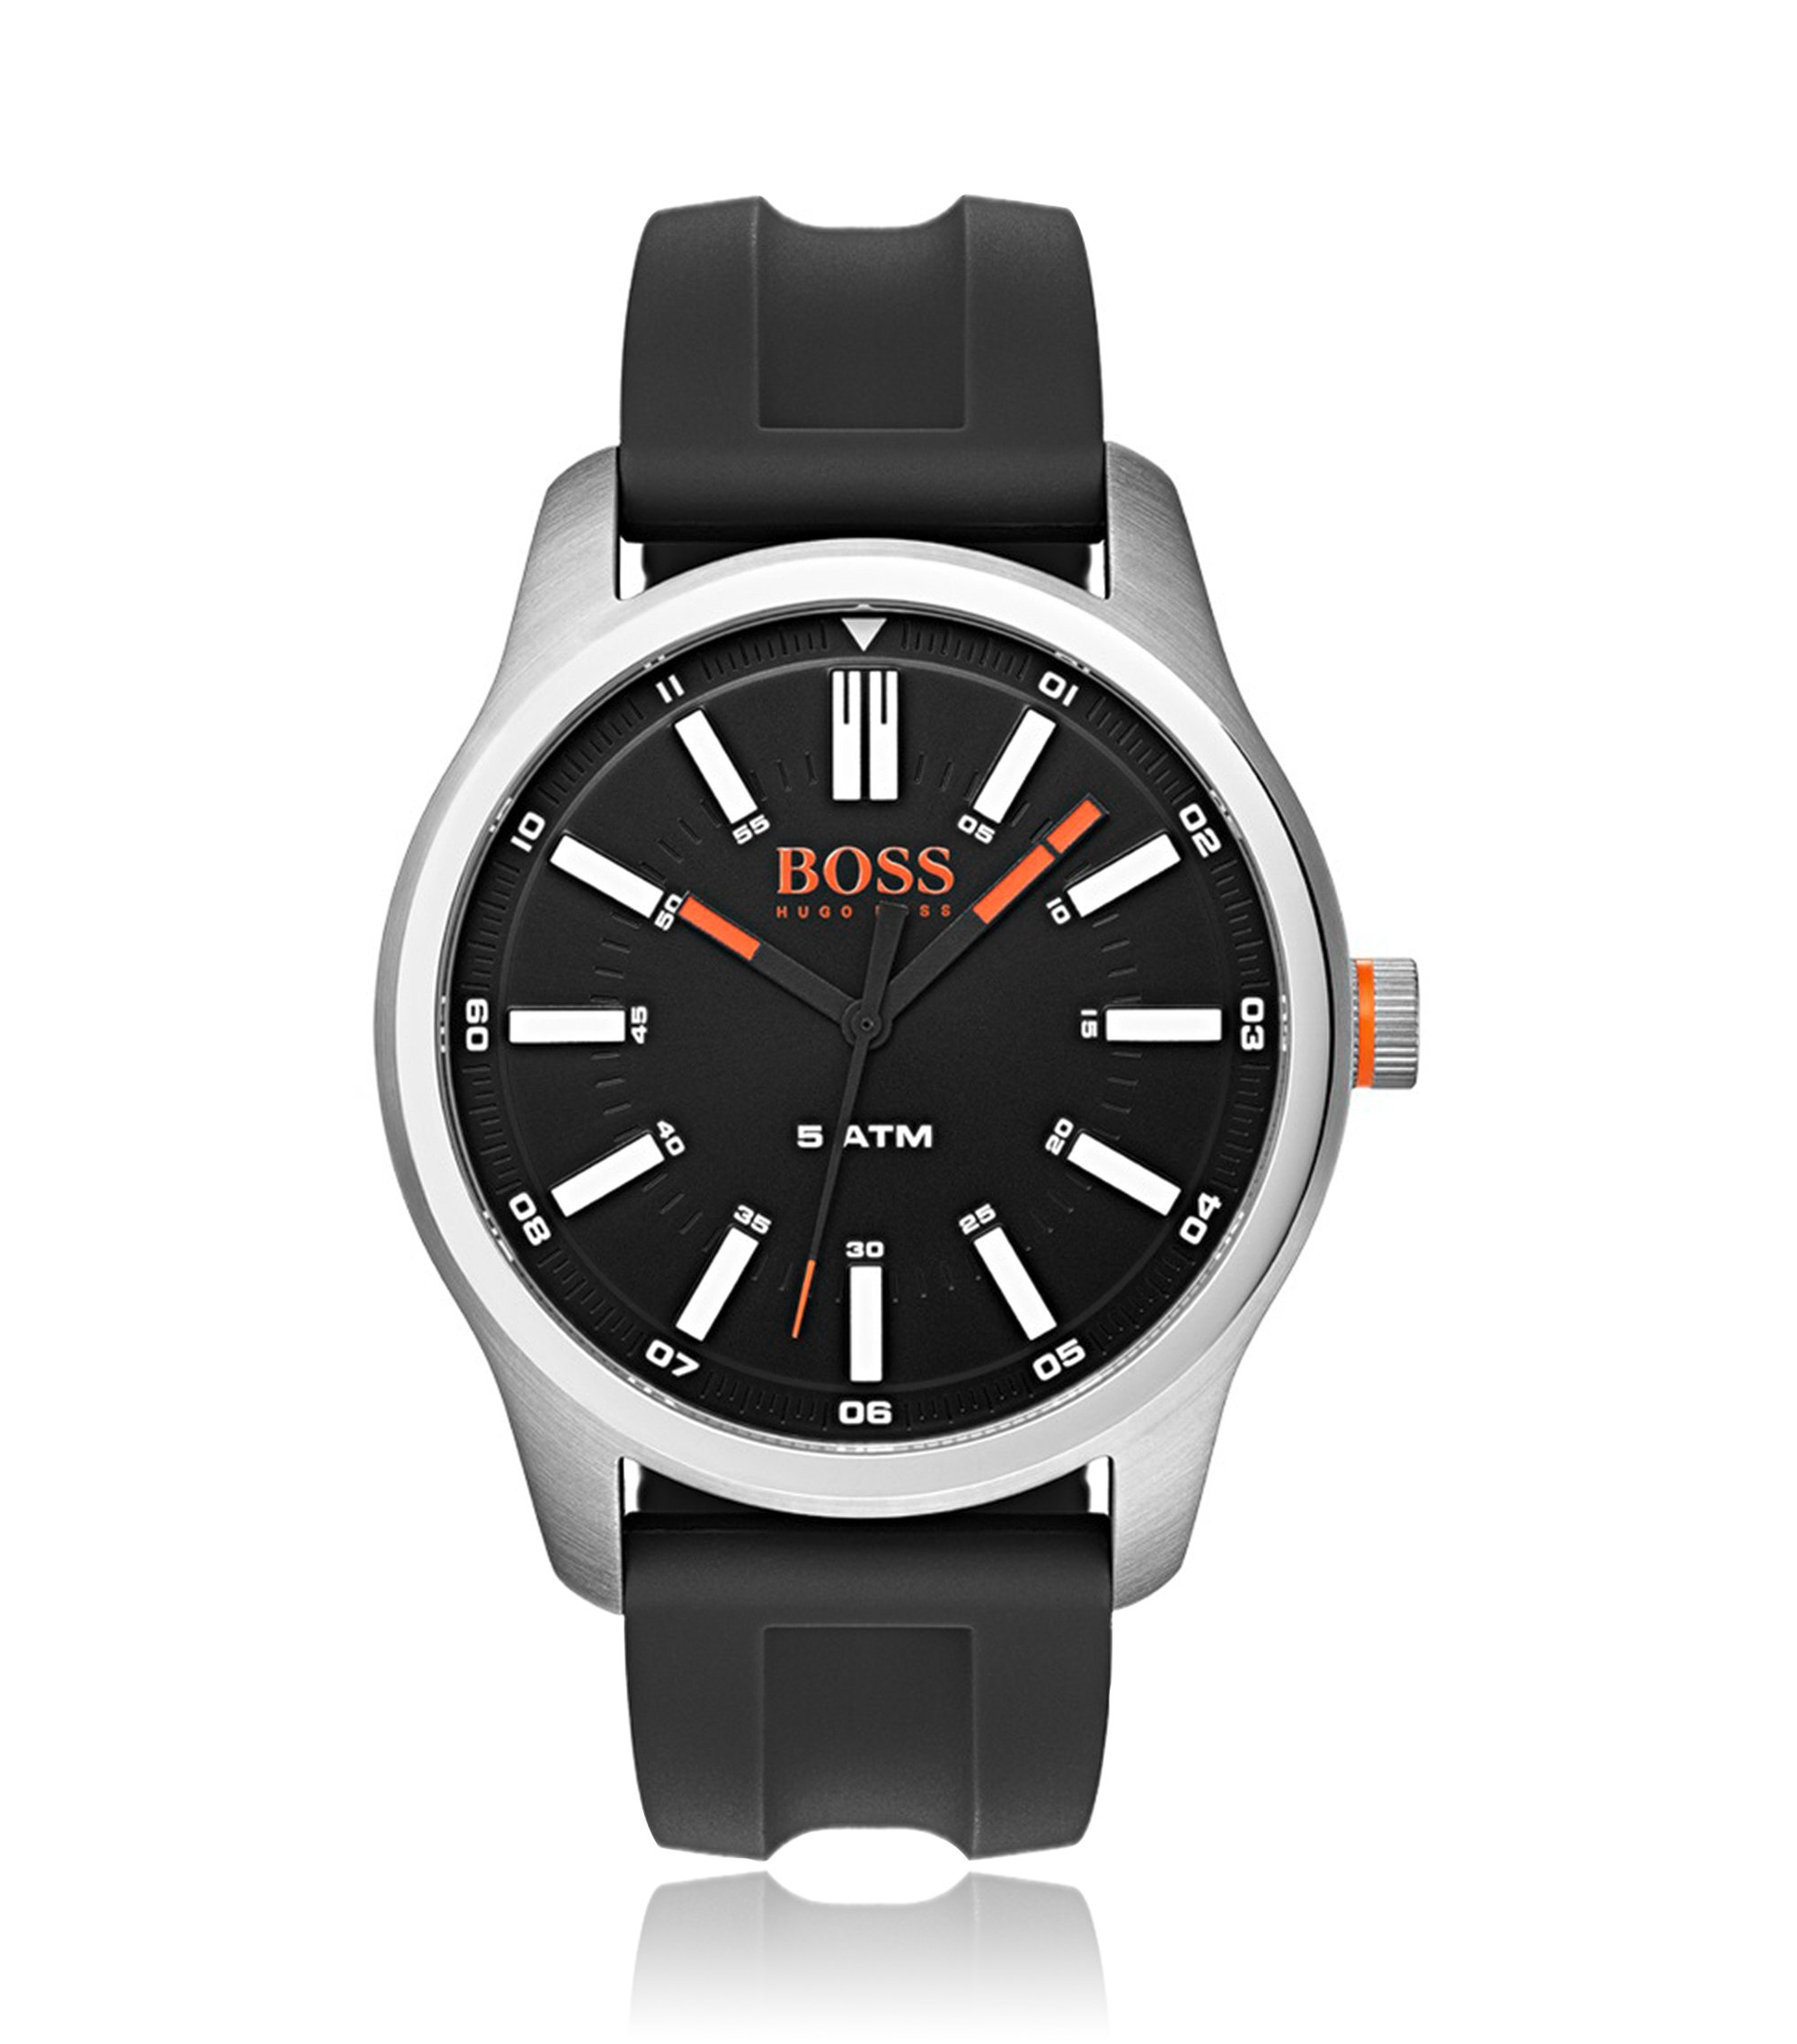 Uhr aus Edelstahl mit Silikonarmband, Assorted-Pre-Pack